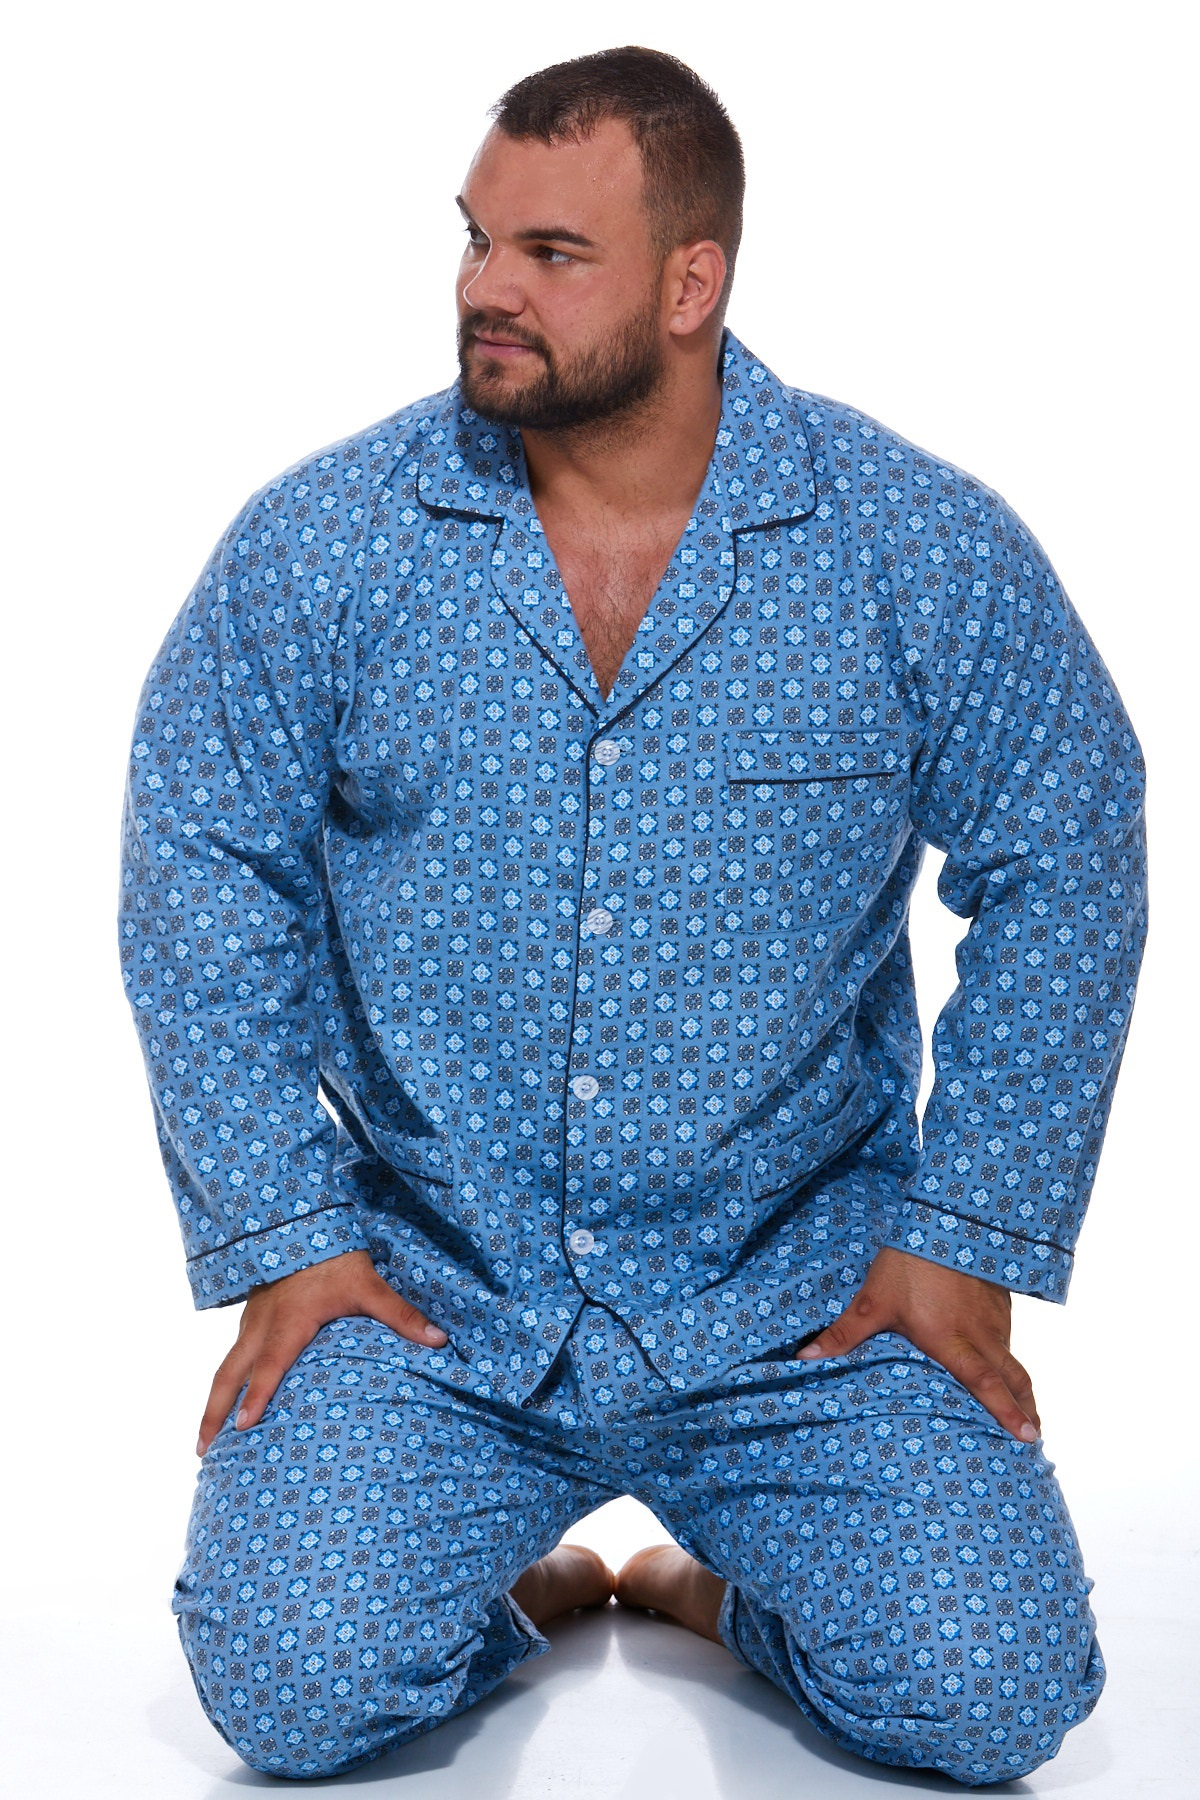 Pyžamo pro muže, flanel PAPM126